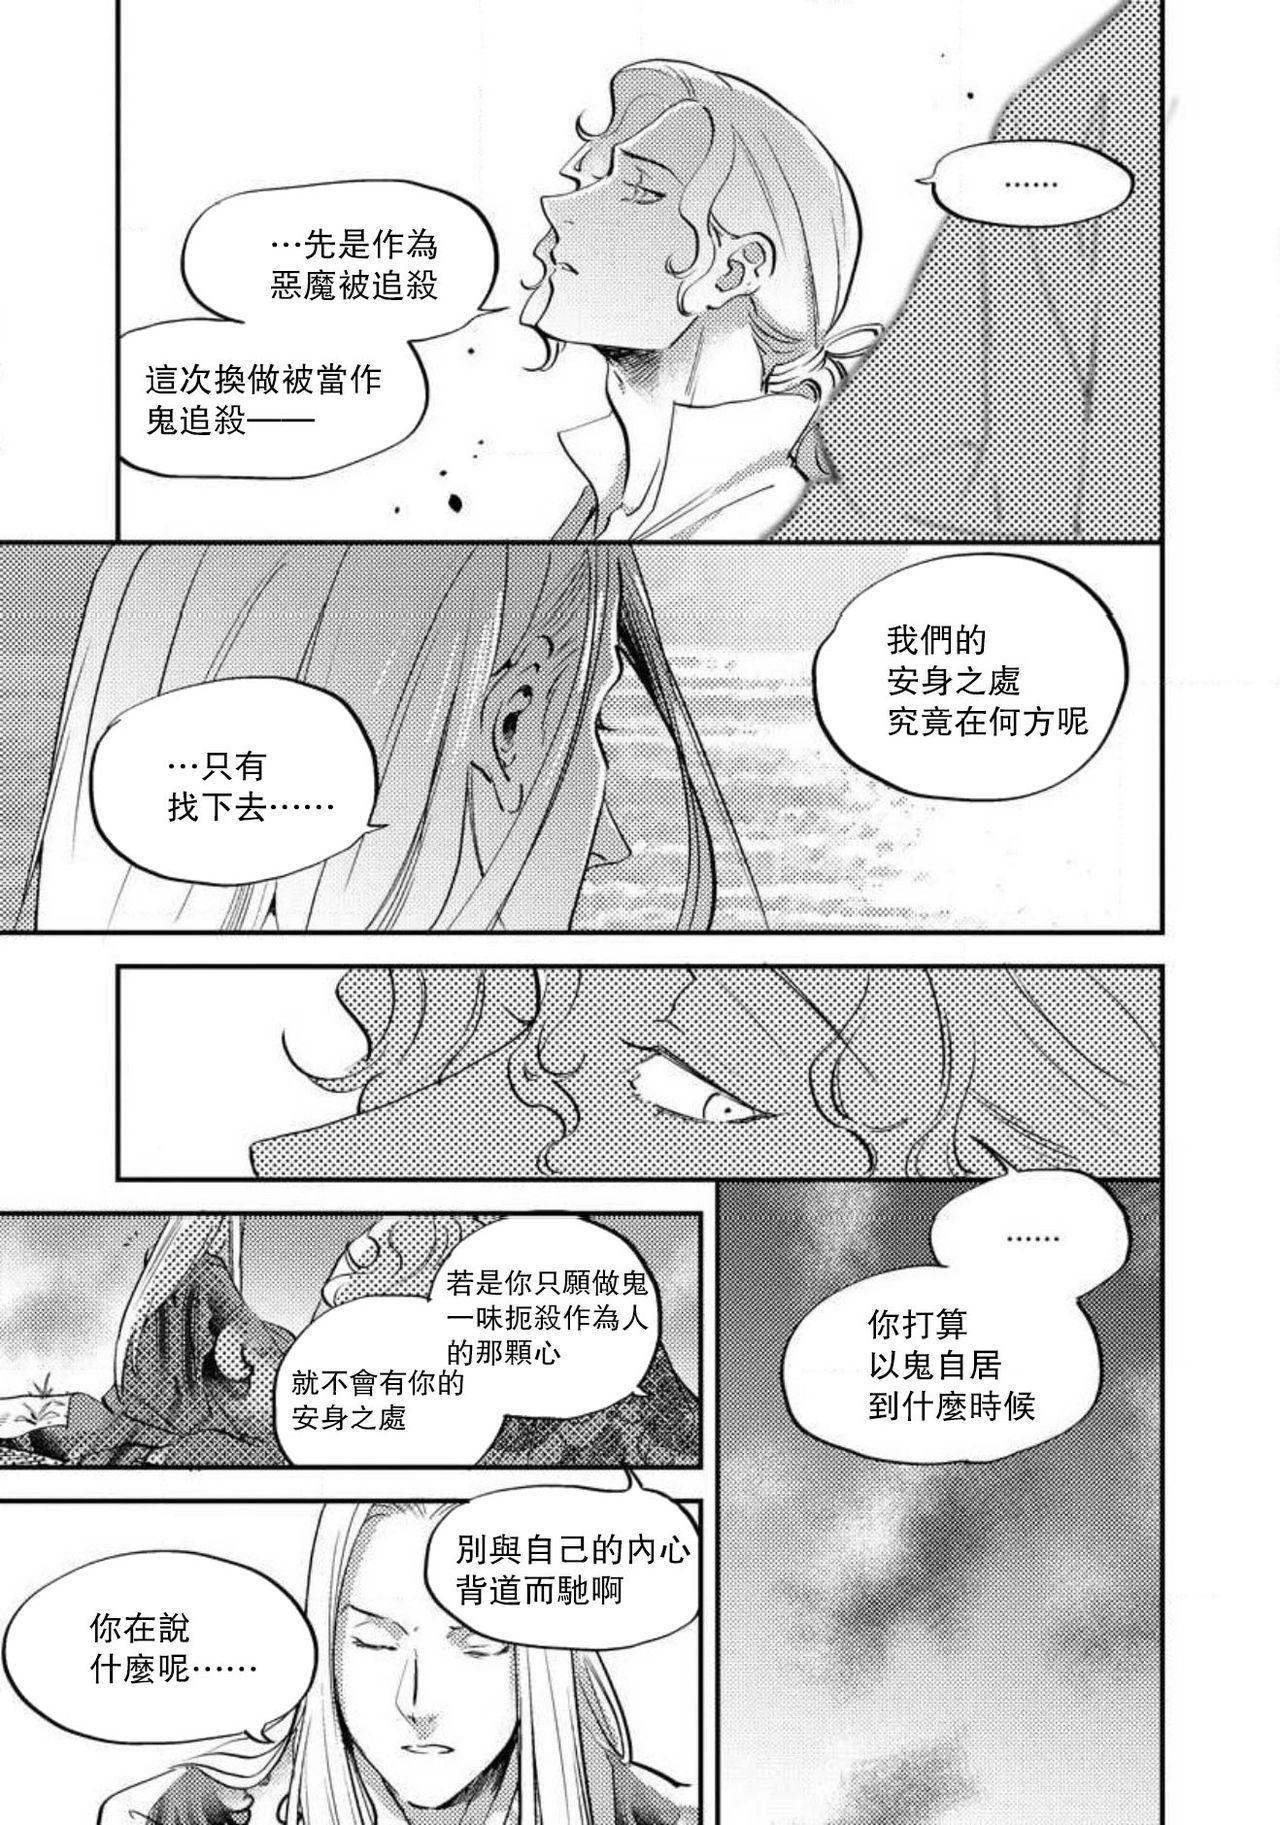 Oeyama suimutan utsukushiki oni no toraware hime | 大江山醉夢逸話 美麗的鬼與被囚禁的公主 Ch. 1-8 158